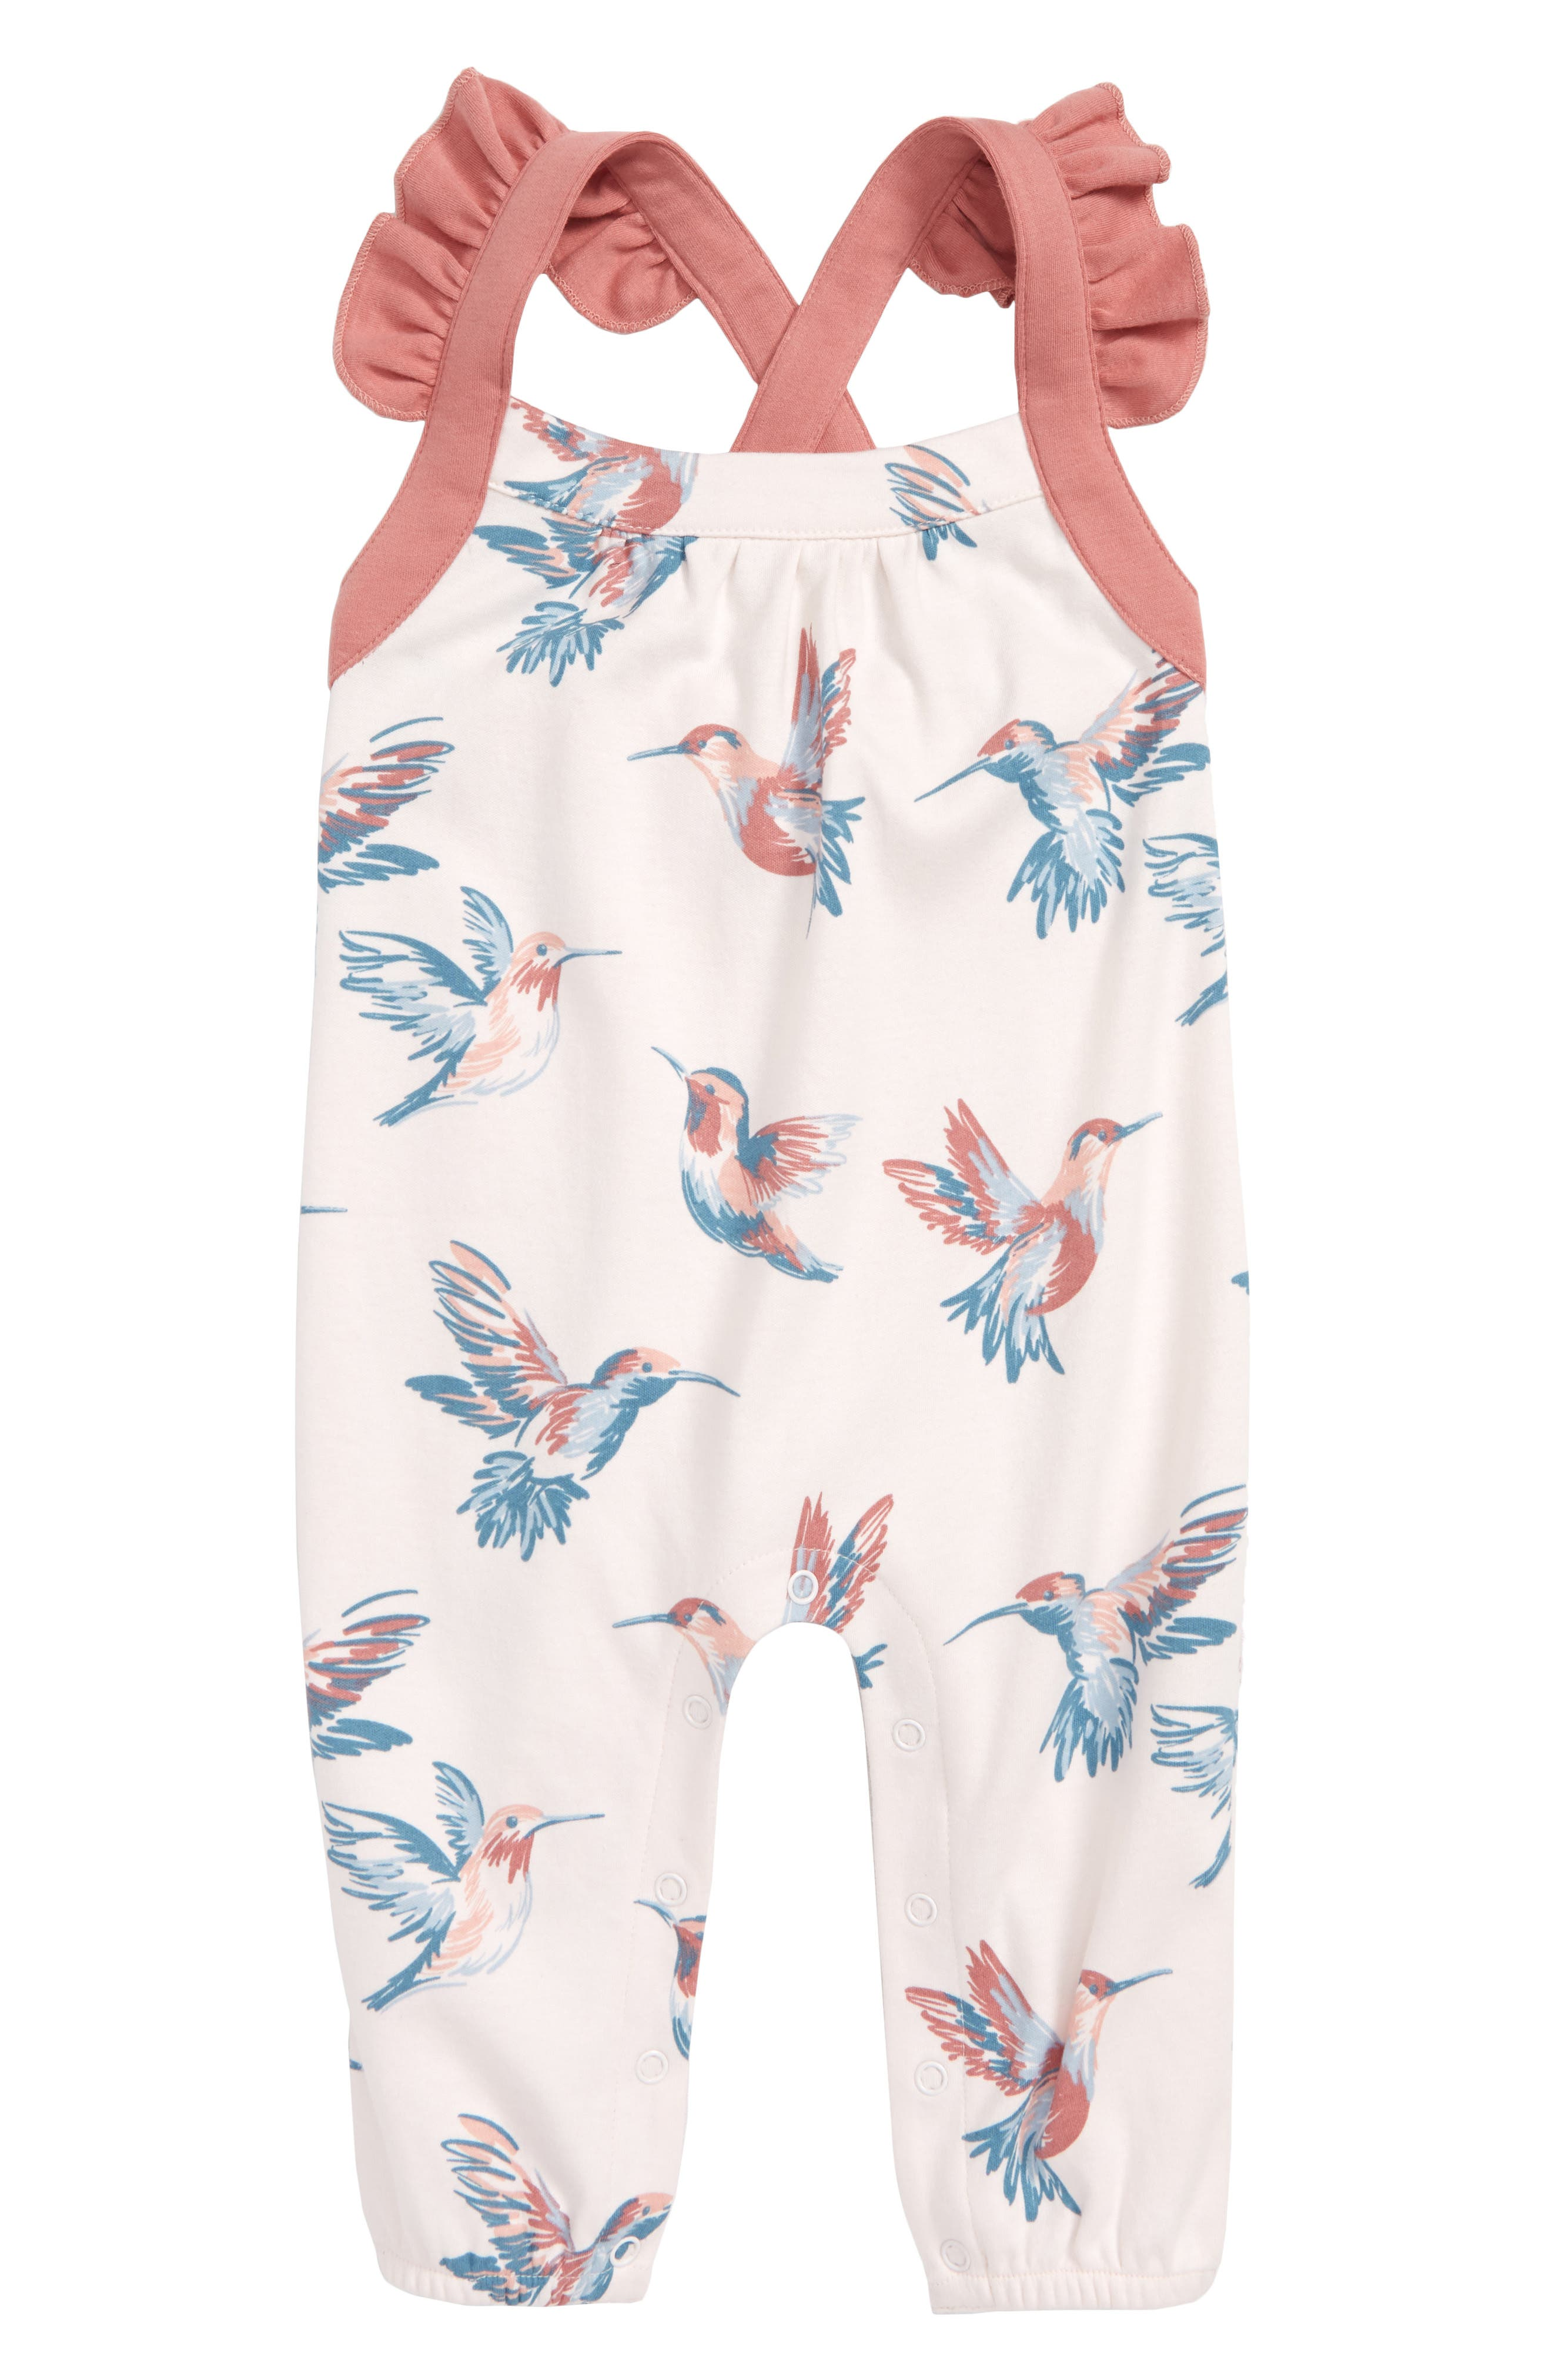 Hummingbirds Organic Cotton Romper,                             Main thumbnail 1, color,                             100